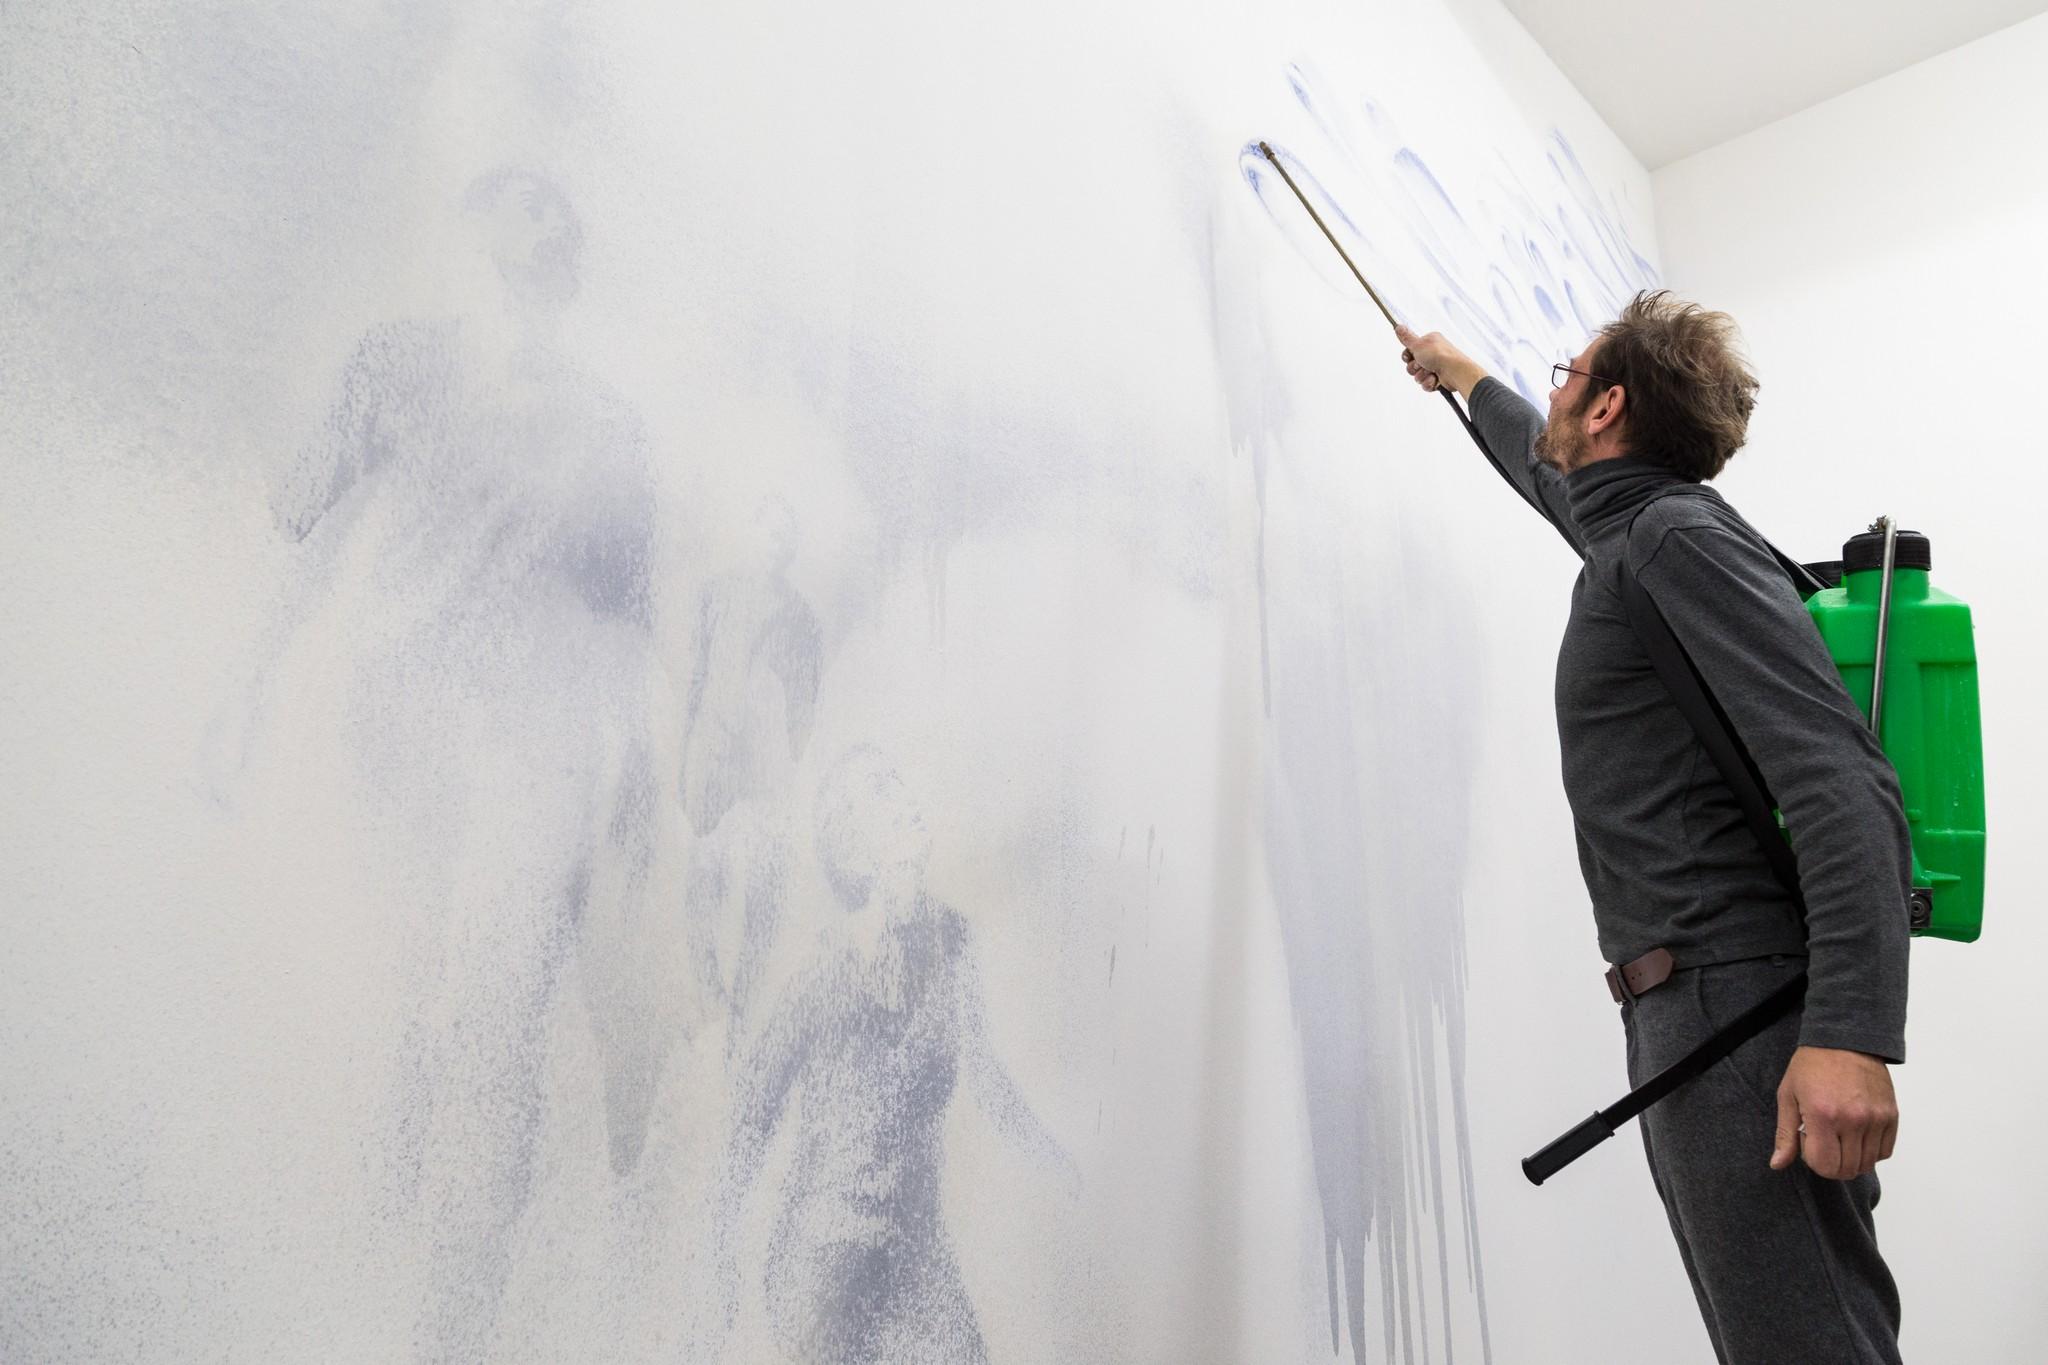 Matteo Montani, Unfolding, Galleria Nicola Pedana, 2017-2018; © Danilo Donzelli Photography